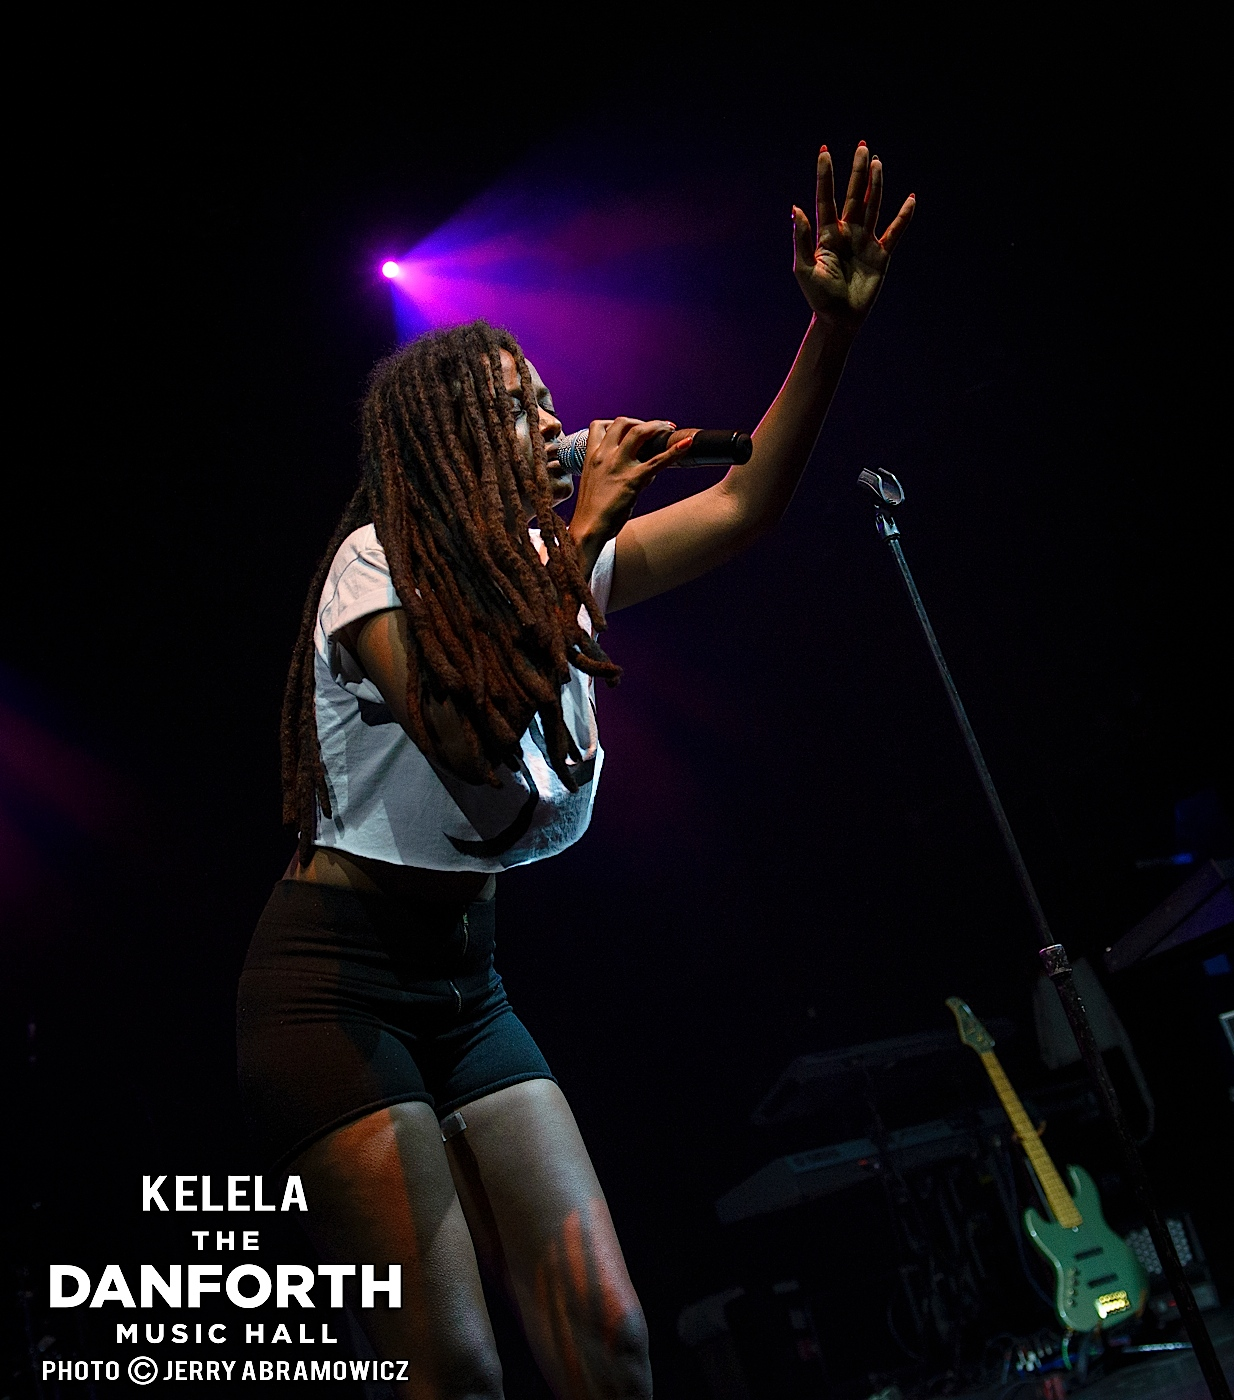 KELELA opens for Solange at The Danforth Music Hall Toronto.